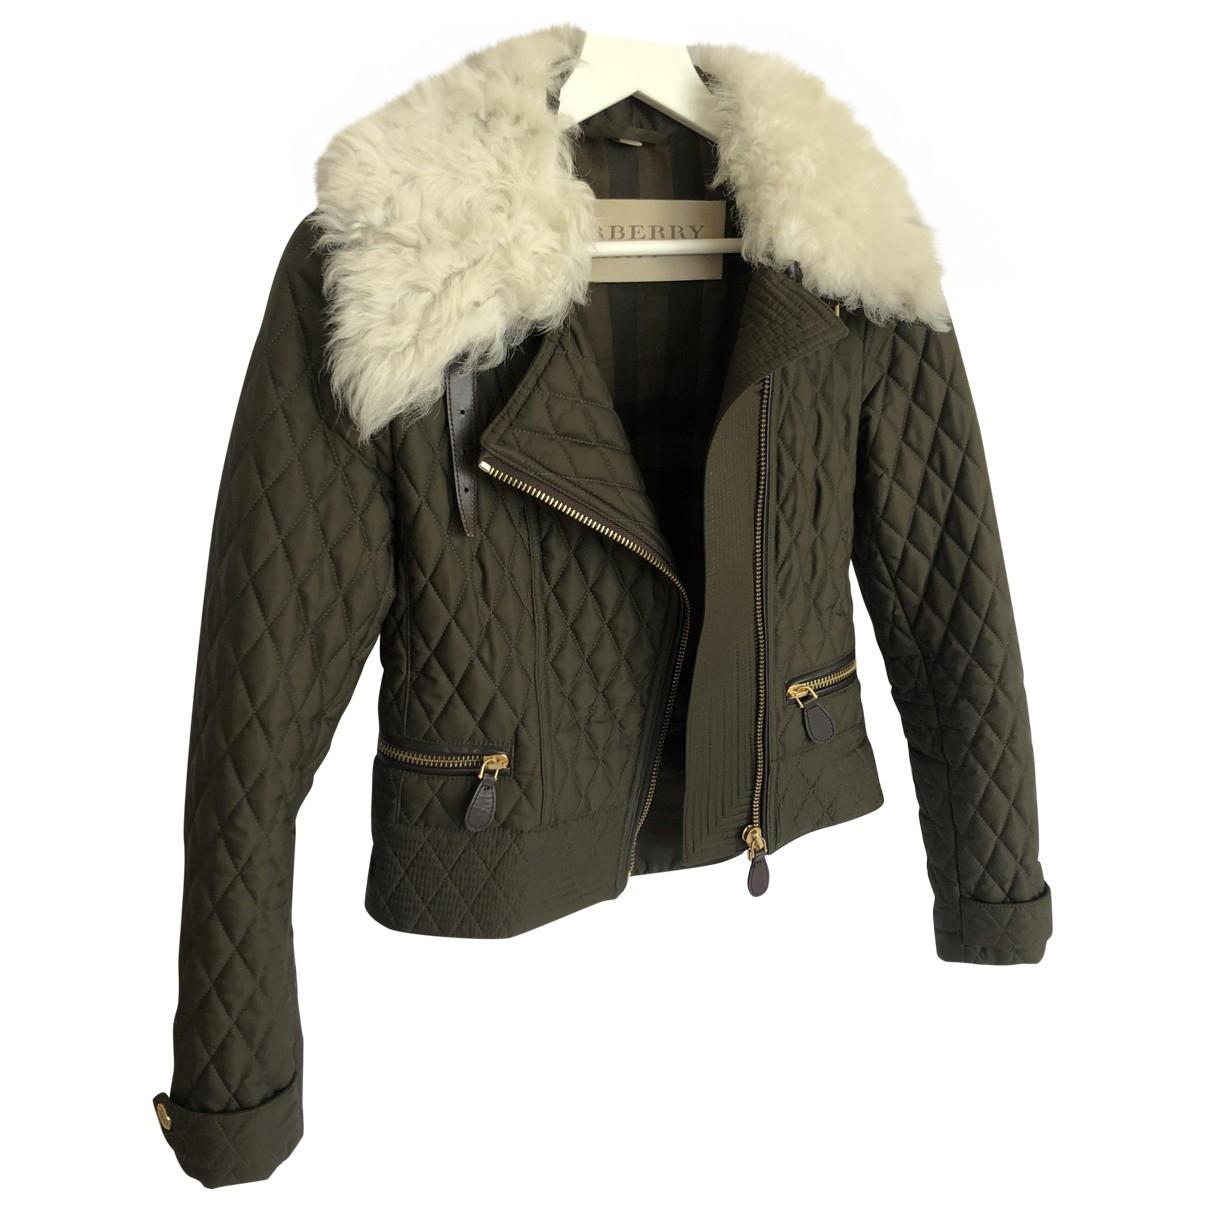 Burberry \N Khaki jacket for Women XS International